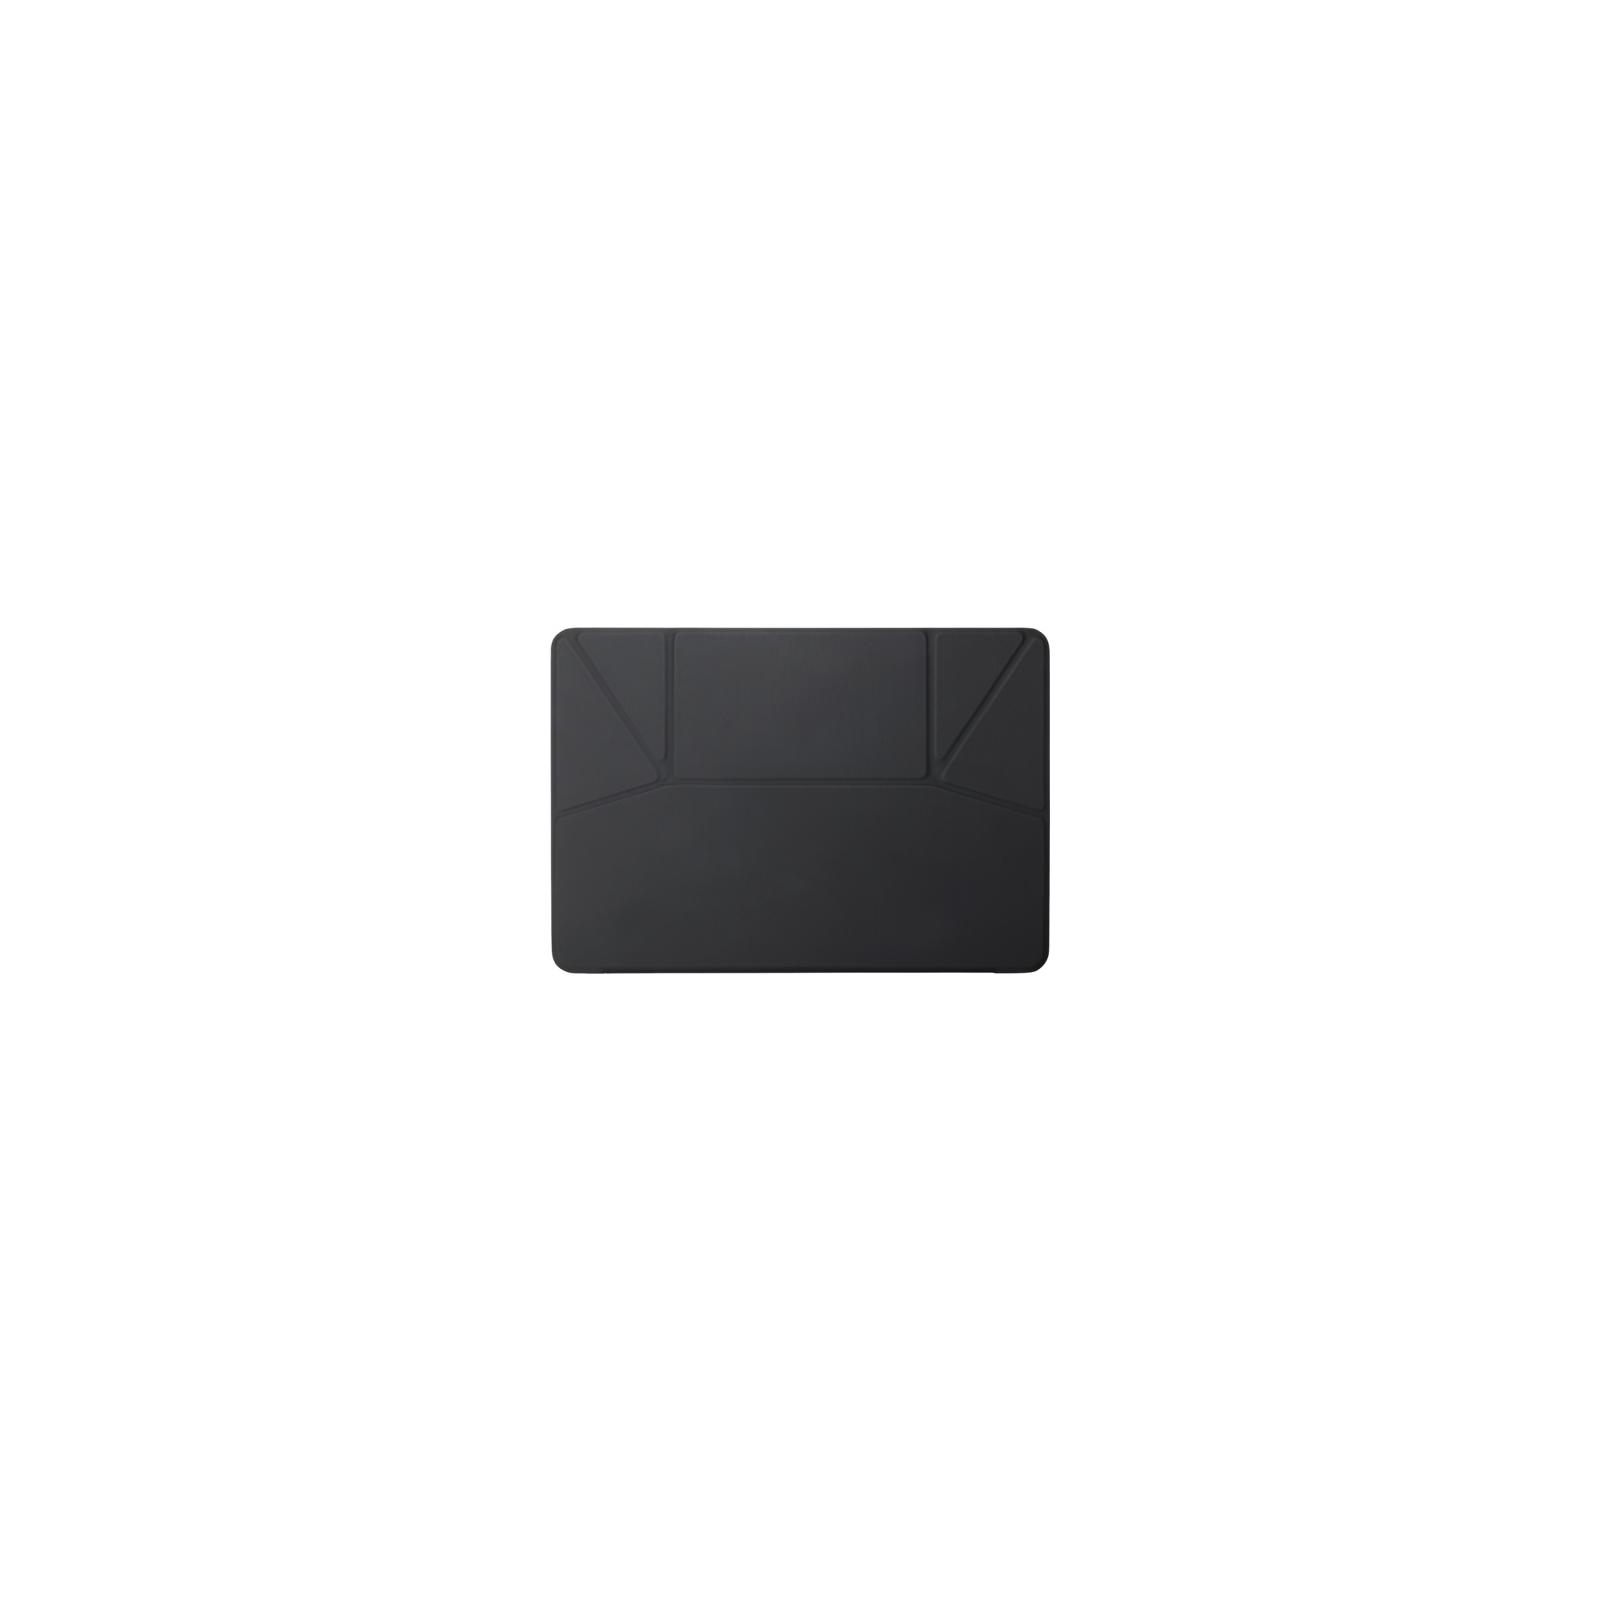 Чехол для планшета ASUS 10.1 ME302C TRANSCOVER/BK (90XB00GP-BSL0Q0)